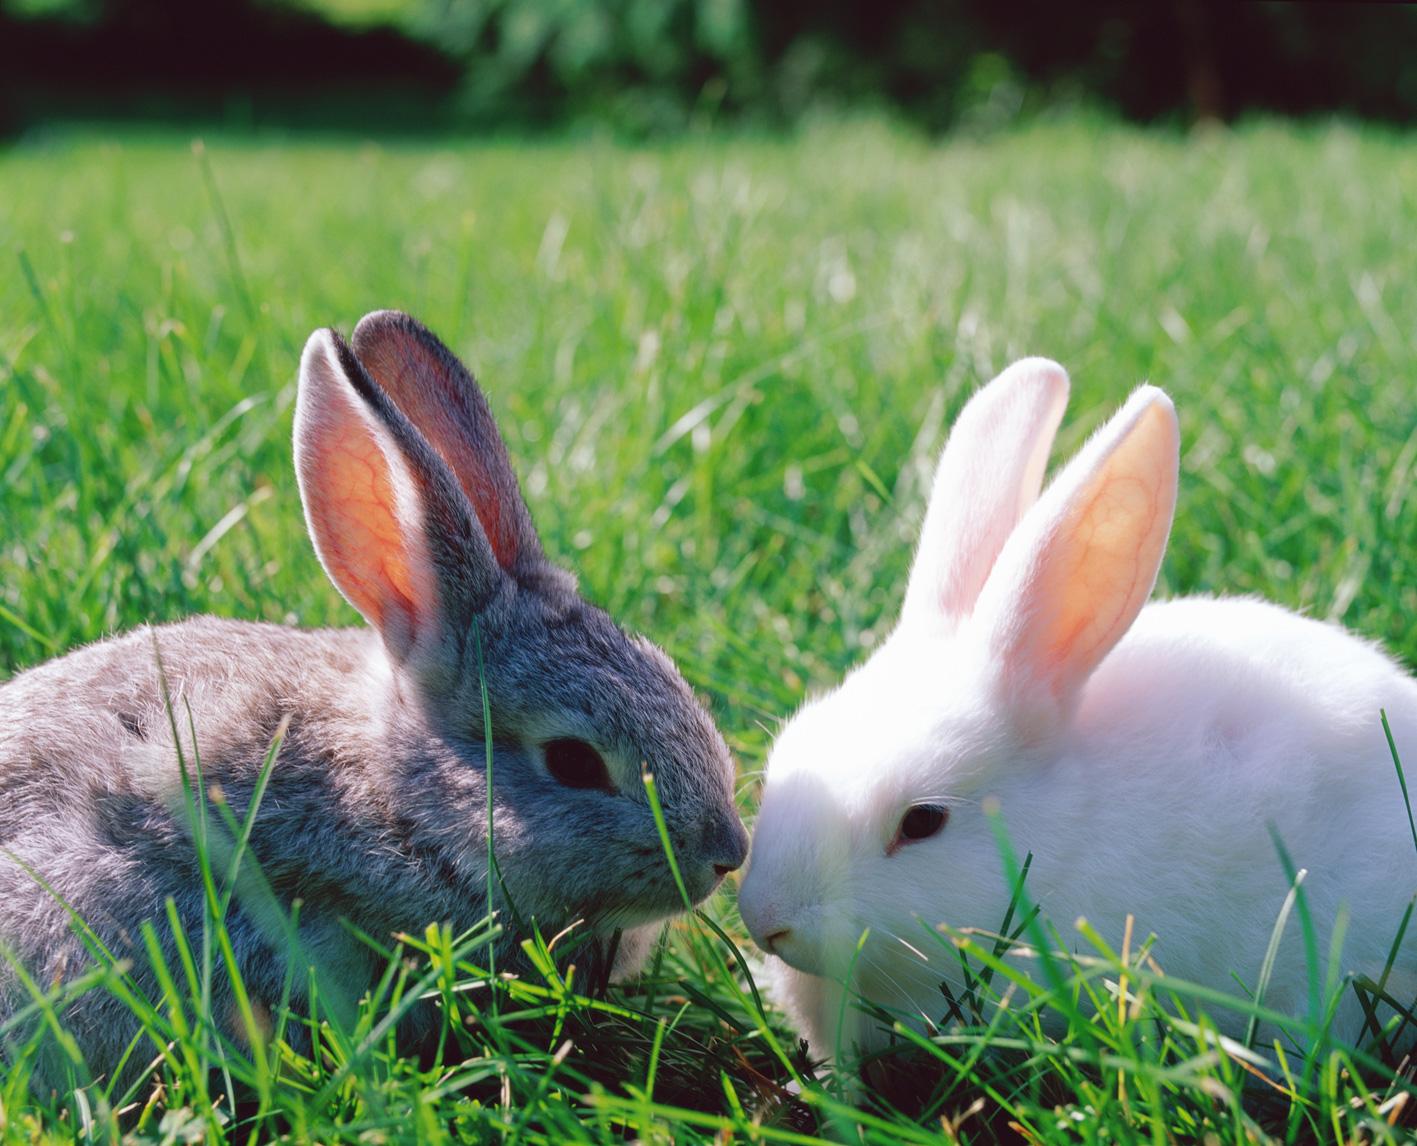 North tollway pet hospital bunnies - Les animaux du jardin ...